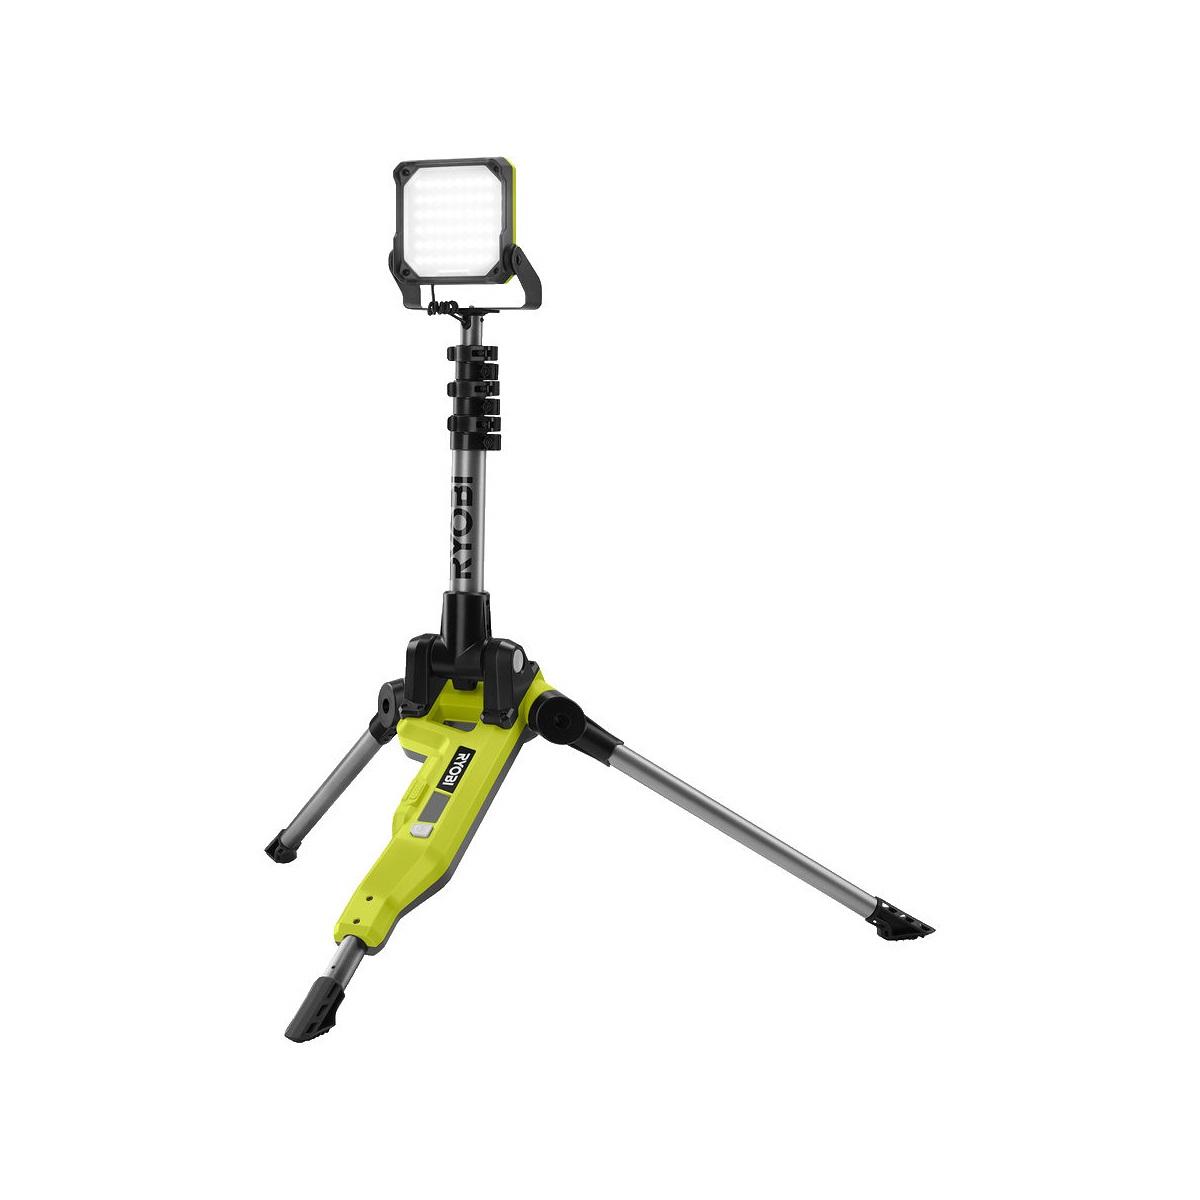 Ryobi R18TL-0aku 18 V pracovní reflektor se stojanem ONE+(bez baterie a nabíječky)